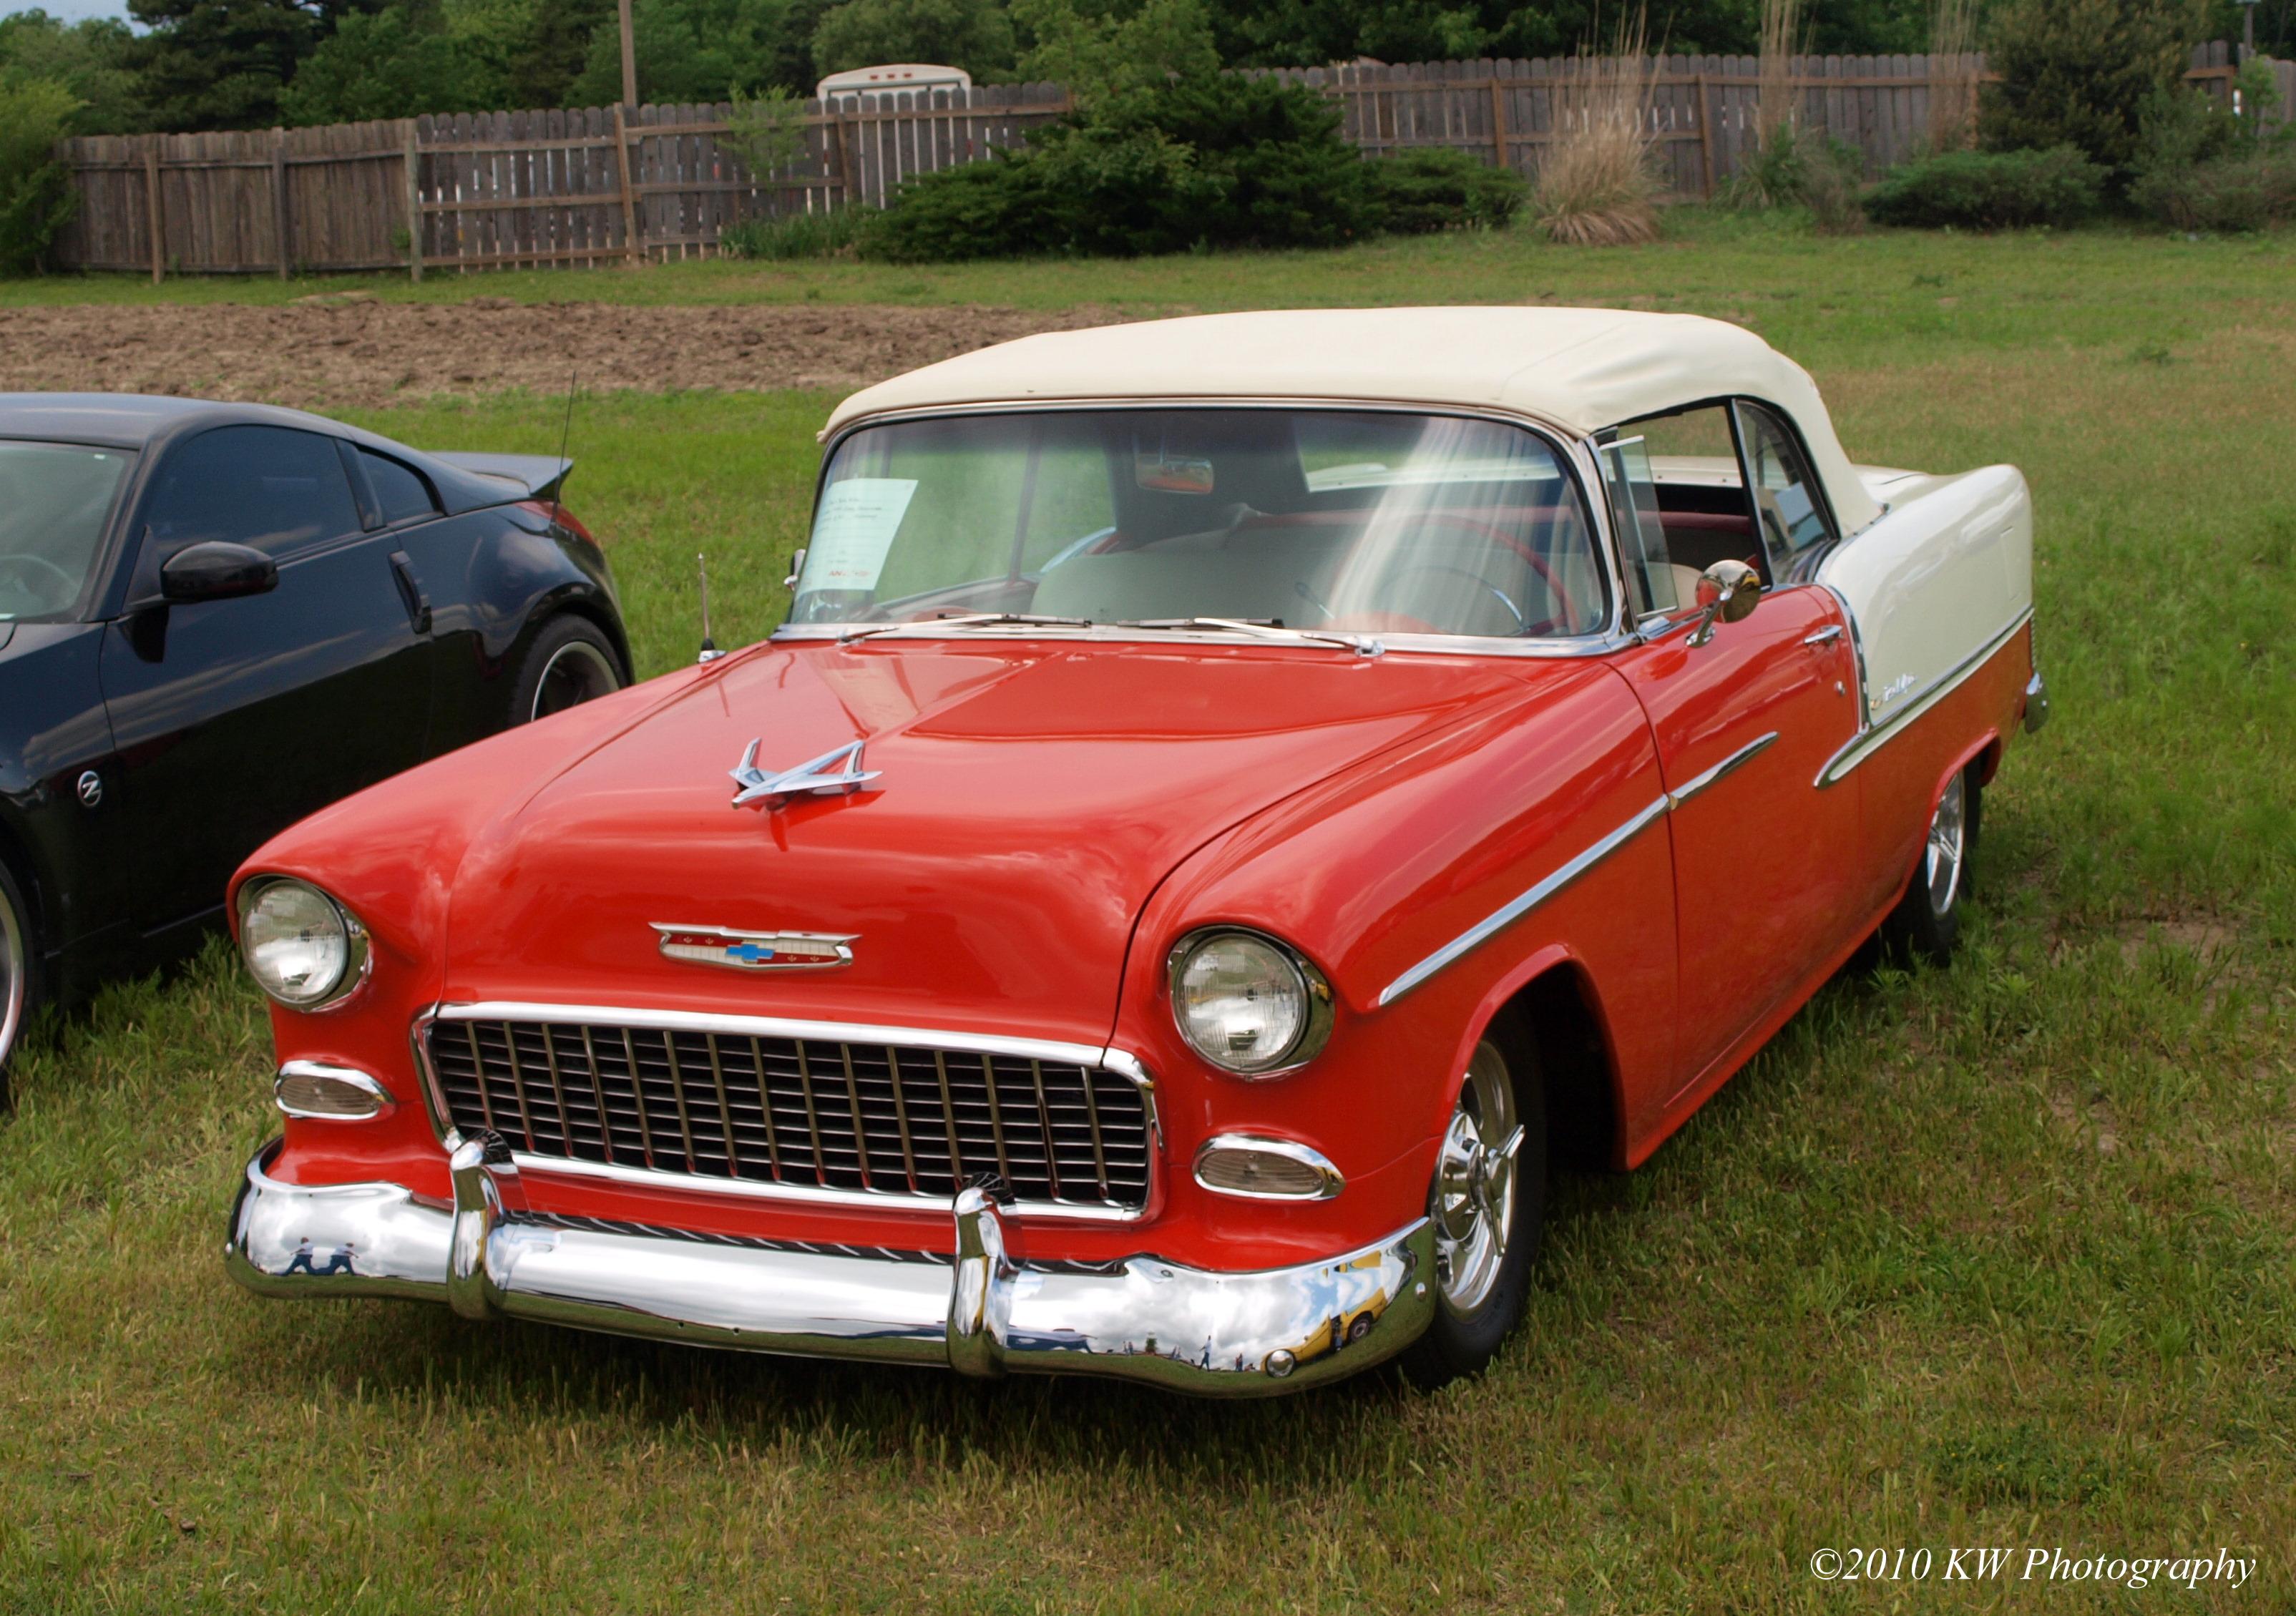 1955 Chevy Parts For Sale On Craigslist Autos Post